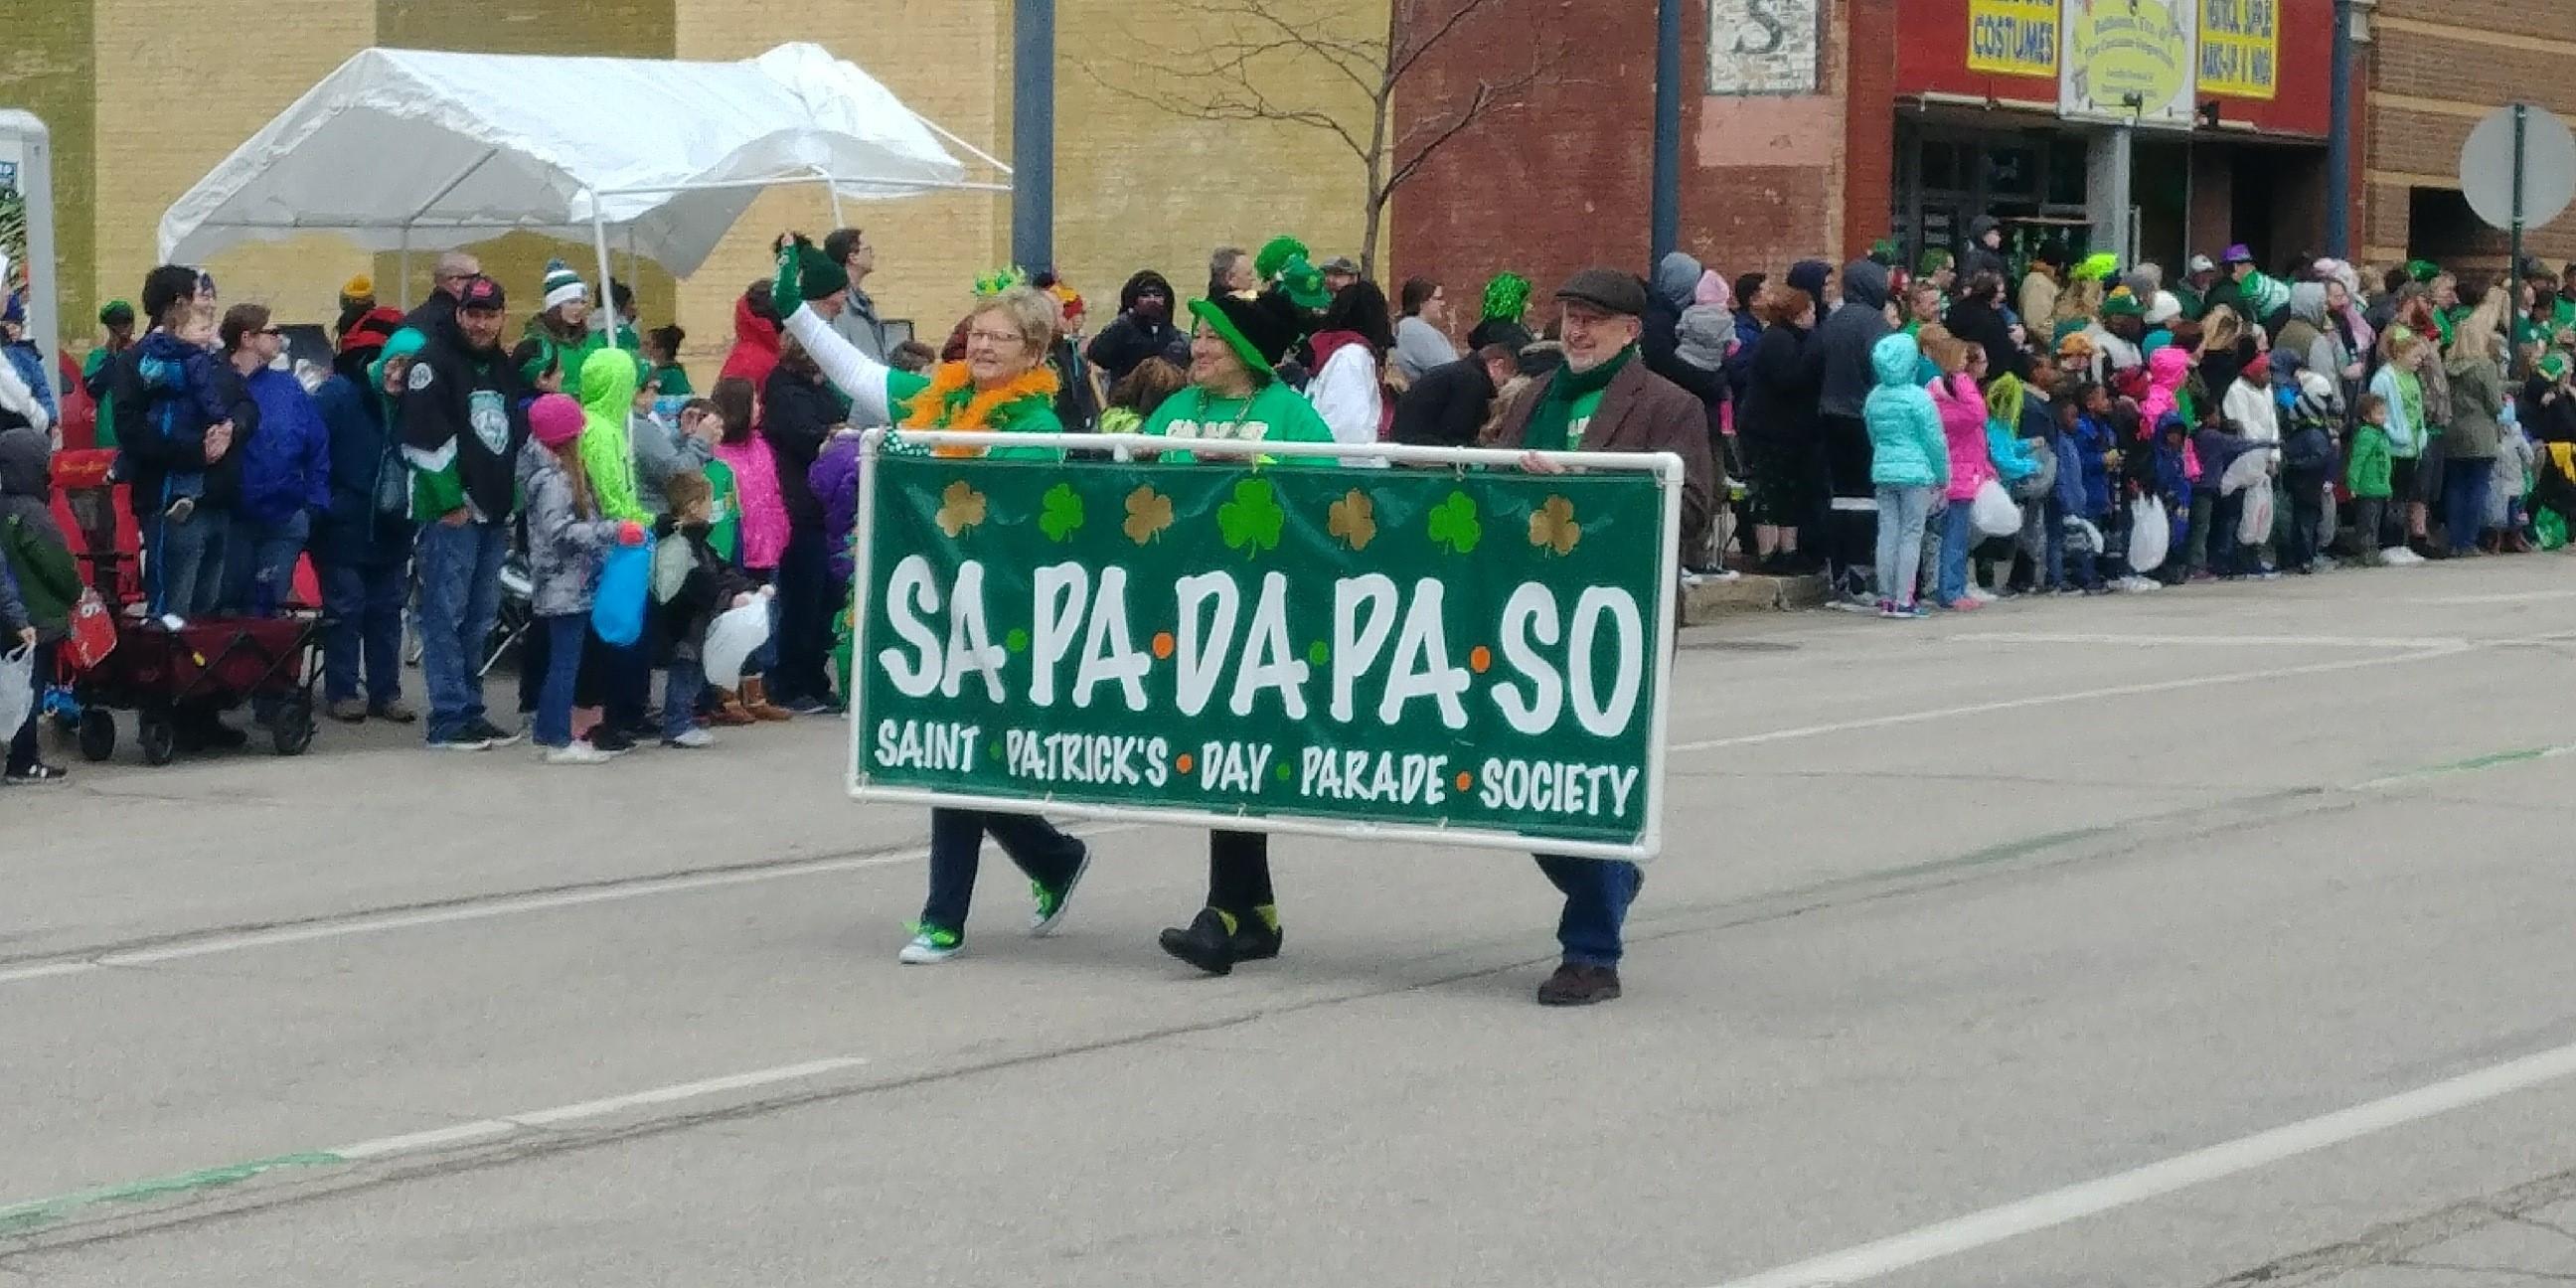 SaPaDaPaSo Sign